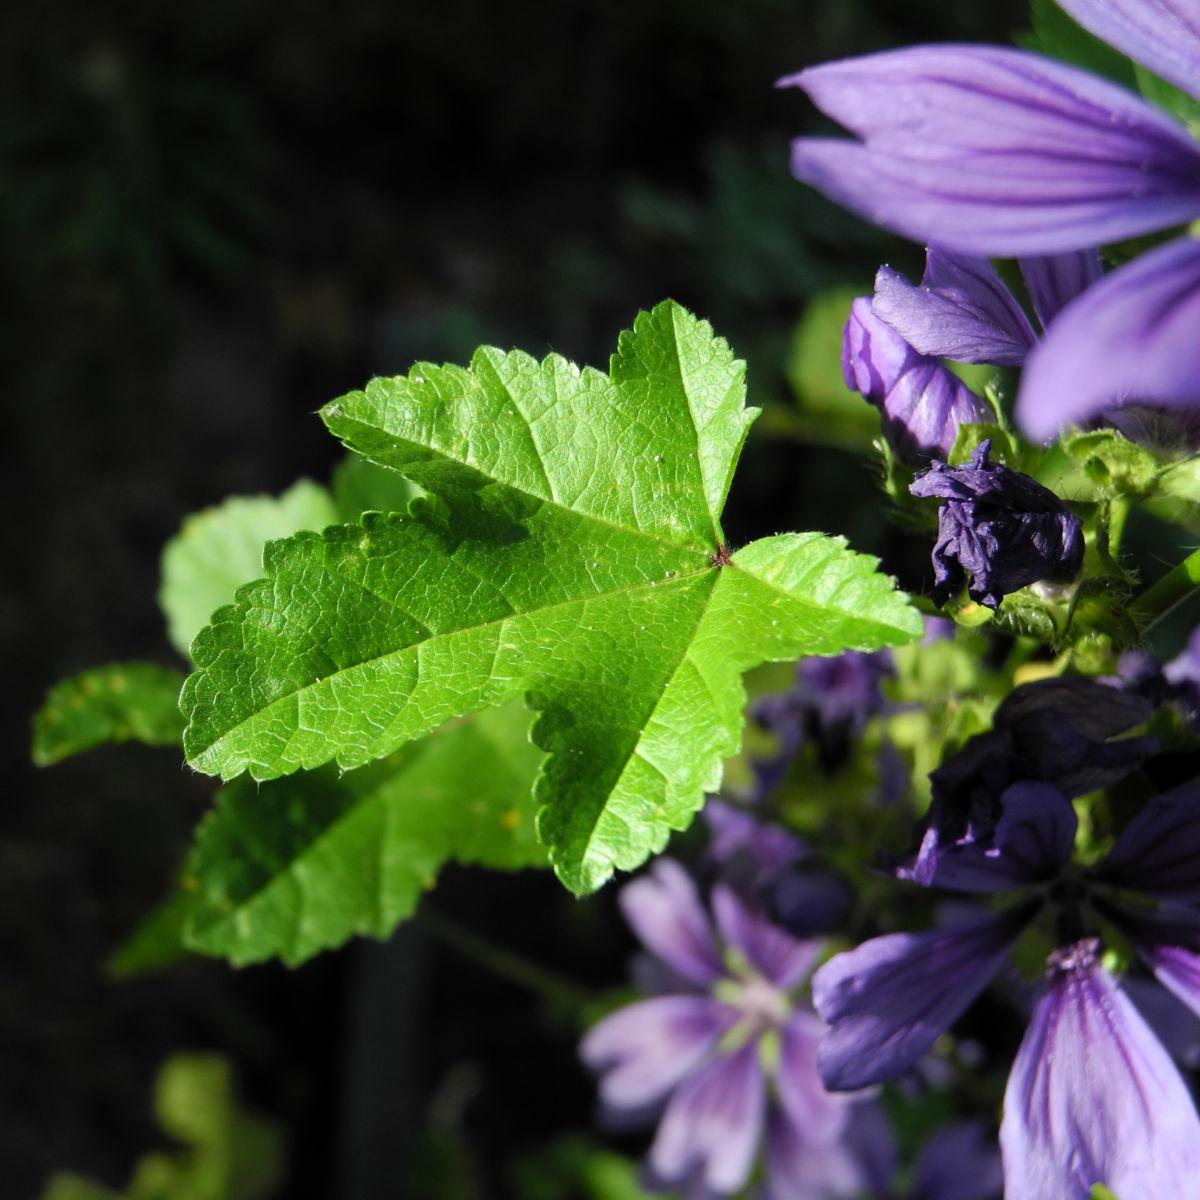 Wilde Malve Blatt gruen Malva sylvestris